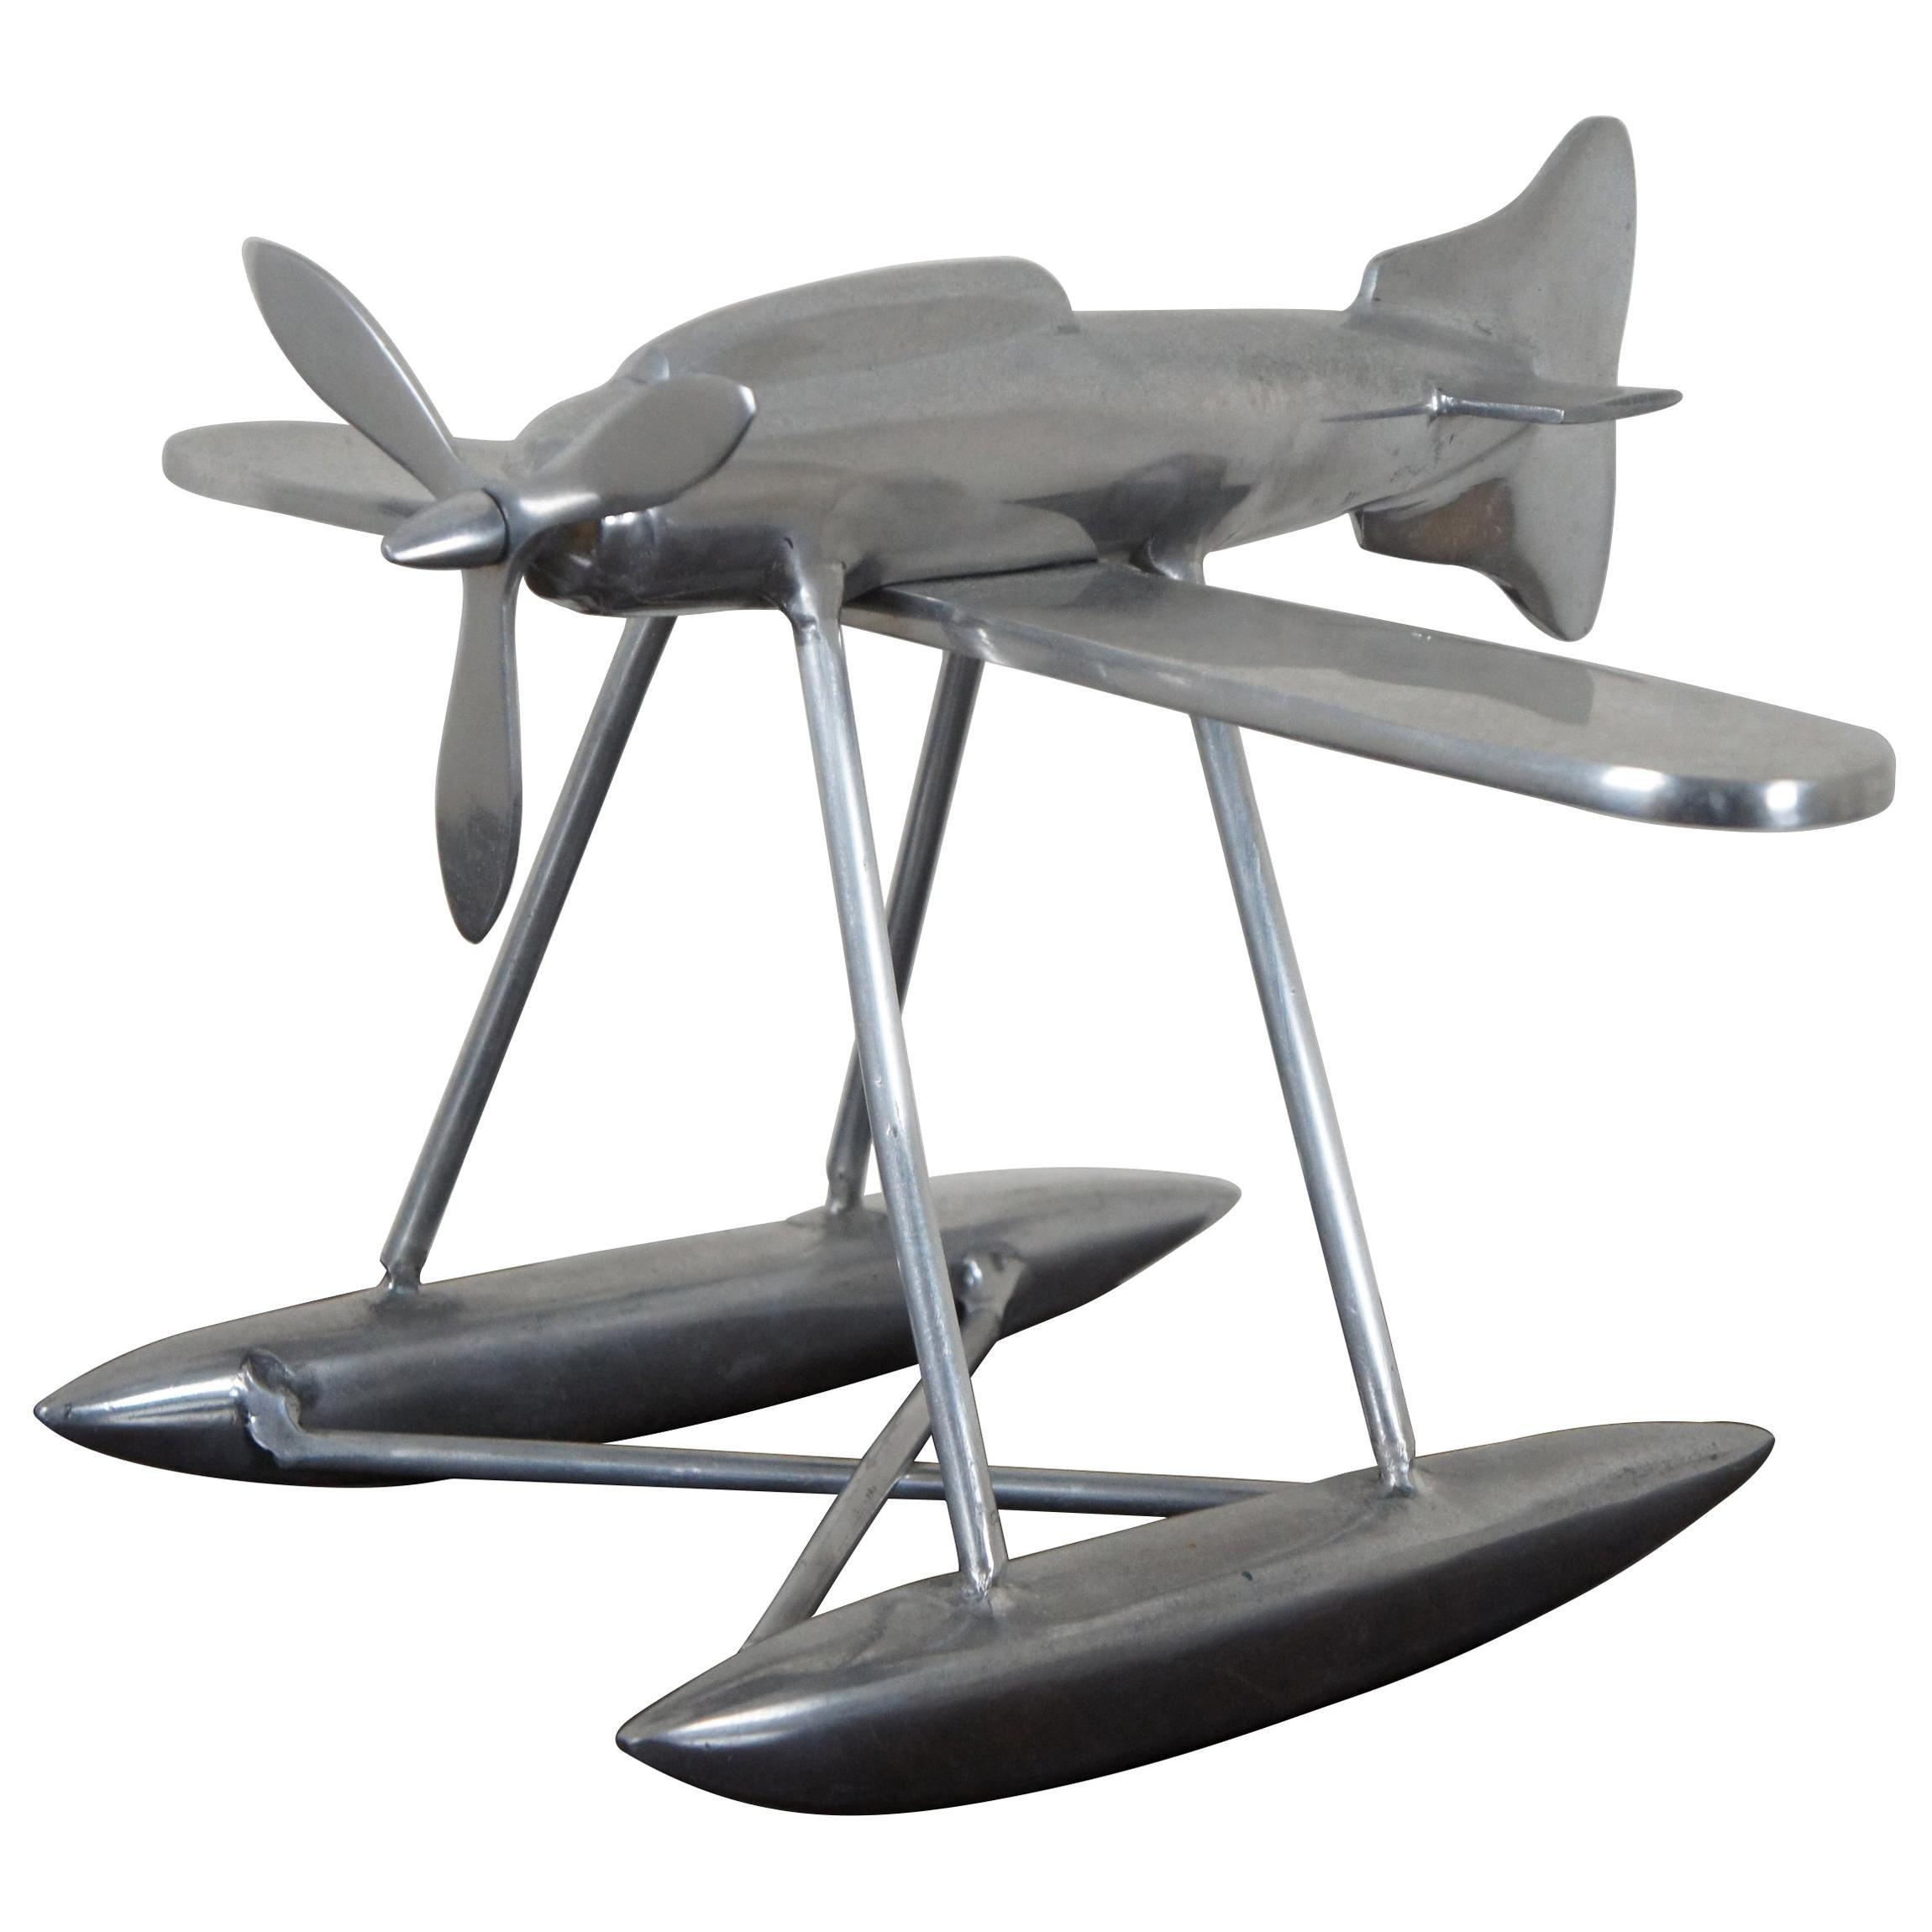 Aluminum Model Sea Propeller Airplane Metal Plane Sculpture Modern Nautical